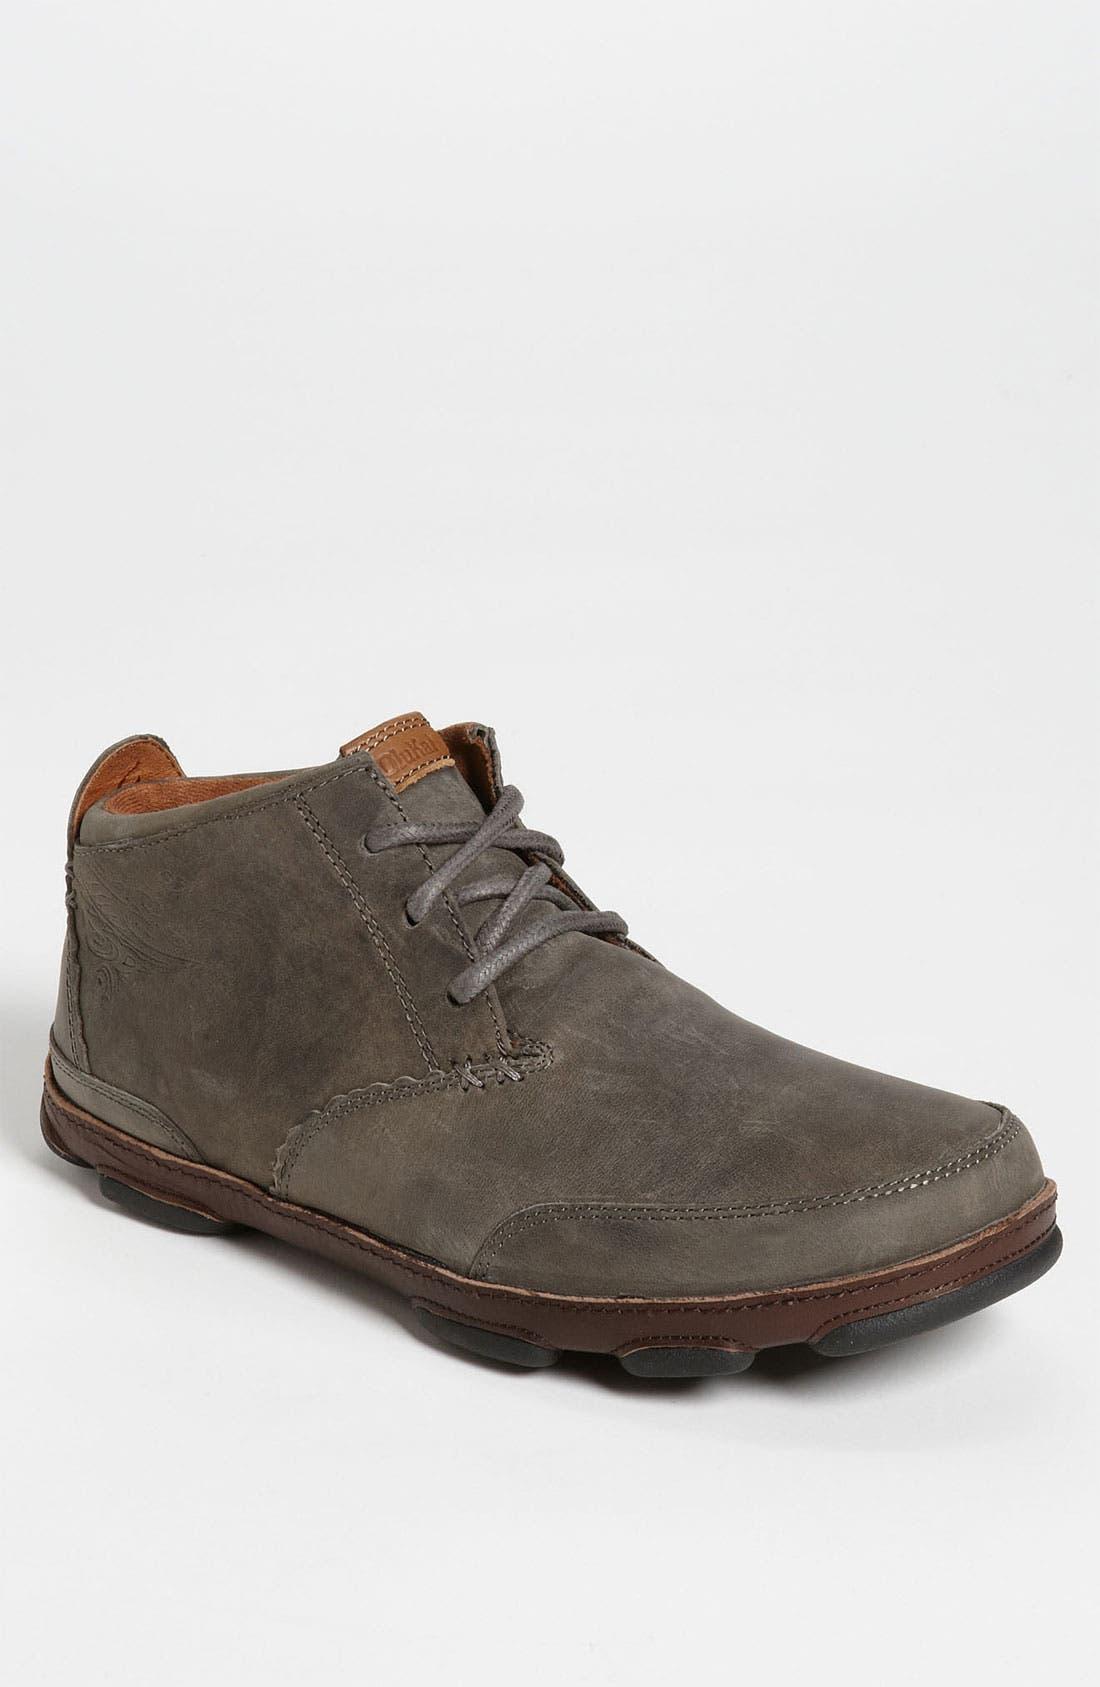 Main Image - OluKai 'Kamuela' Ankle Boot (Men)